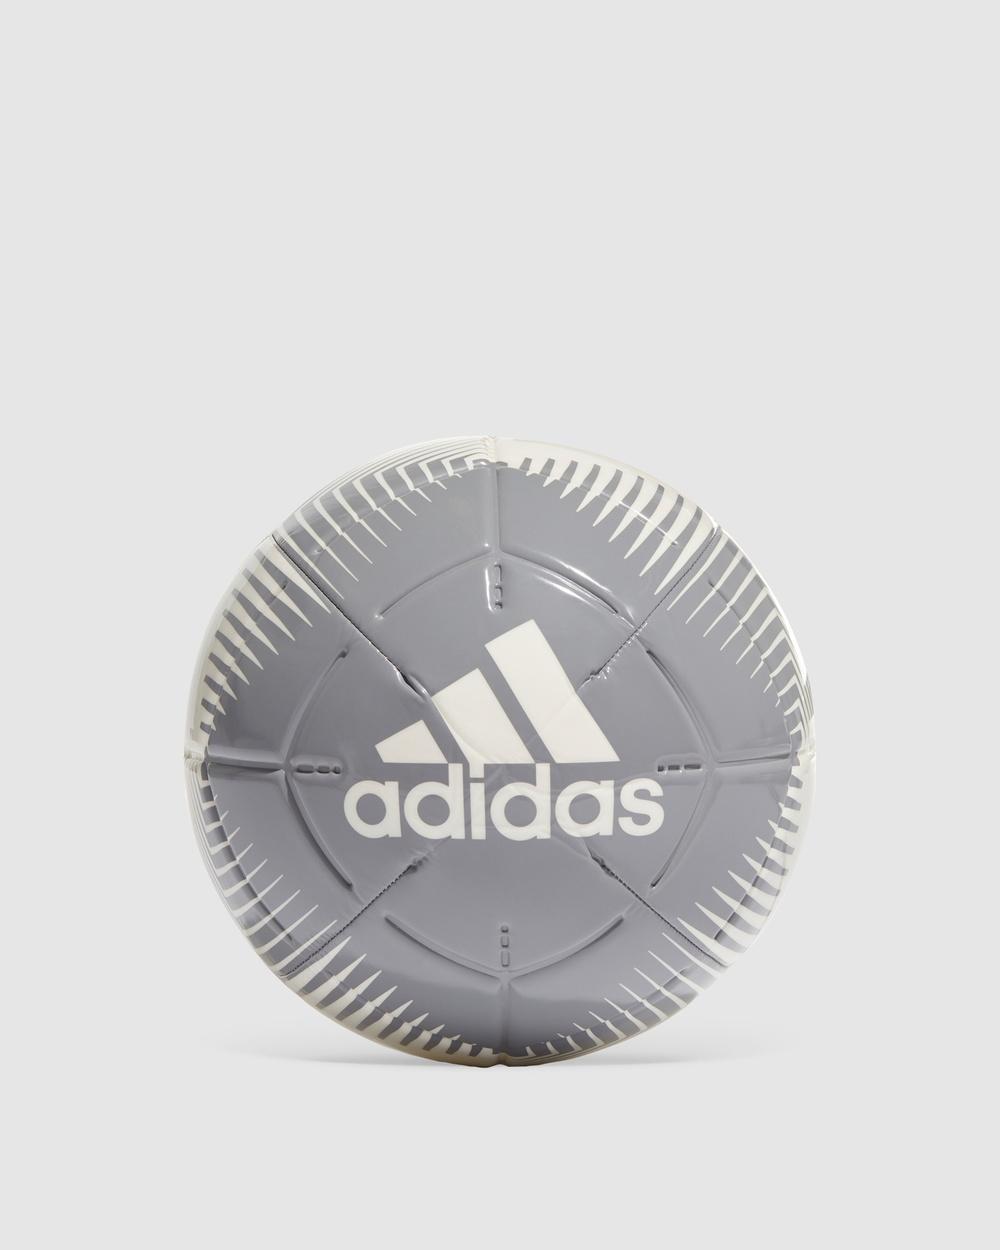 adidas Performance EPP II Club Ball Sports Equipment White